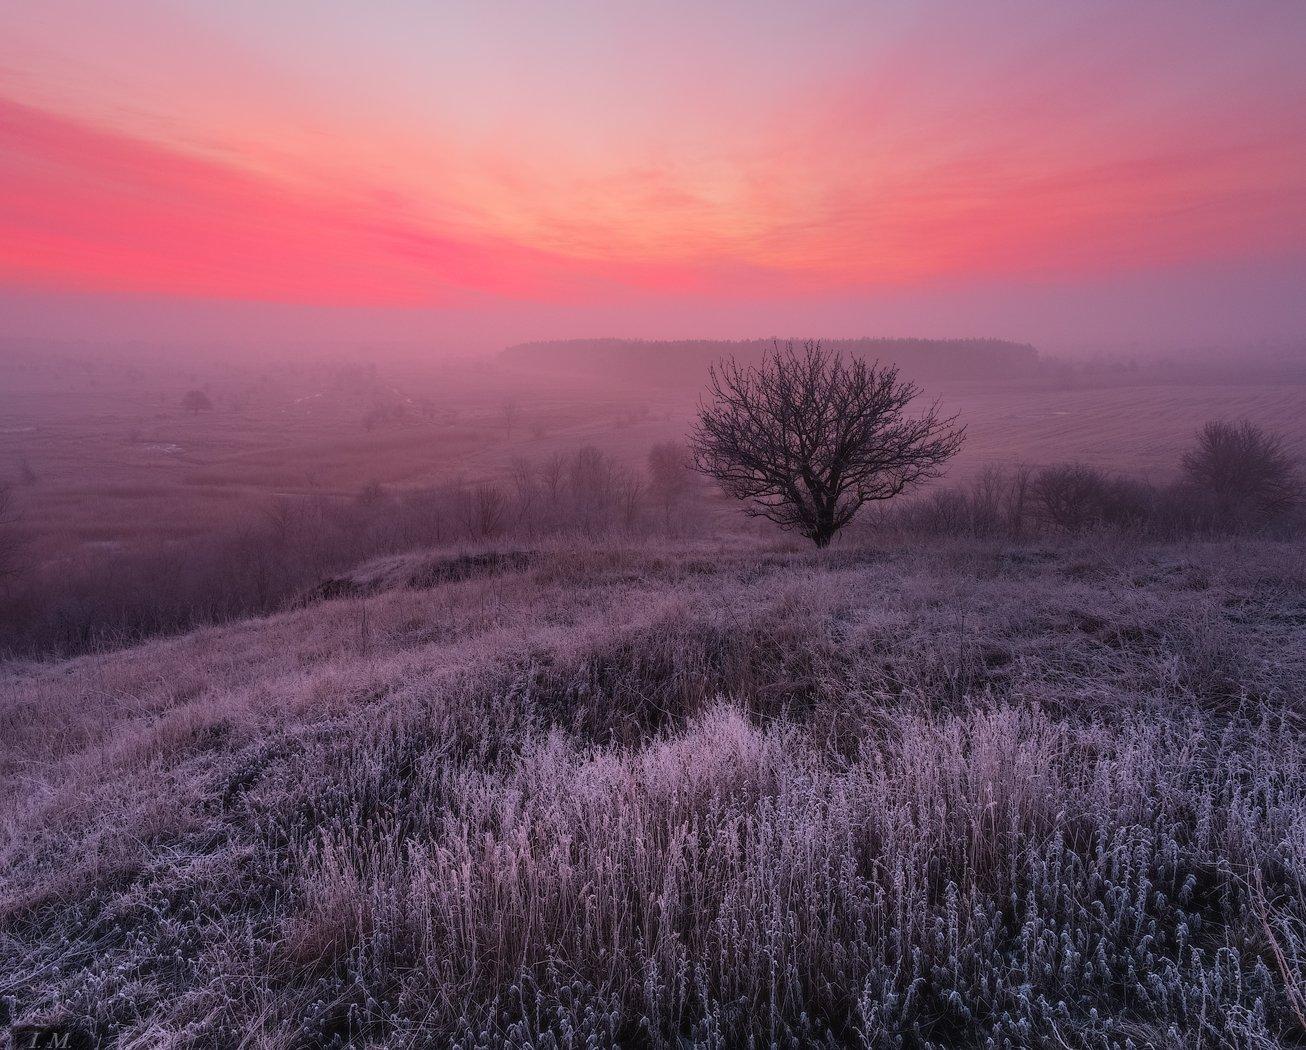 Landscape, light, mood, morning, nature, panorama, sky, sunrise, winter, дерево, иней, панорама, пейзаж, природа, рассвет, свет, туман, Утро, холмы, hills, Magic, colors, frost, foggy dawn, countryside, Ivan Maljarenko